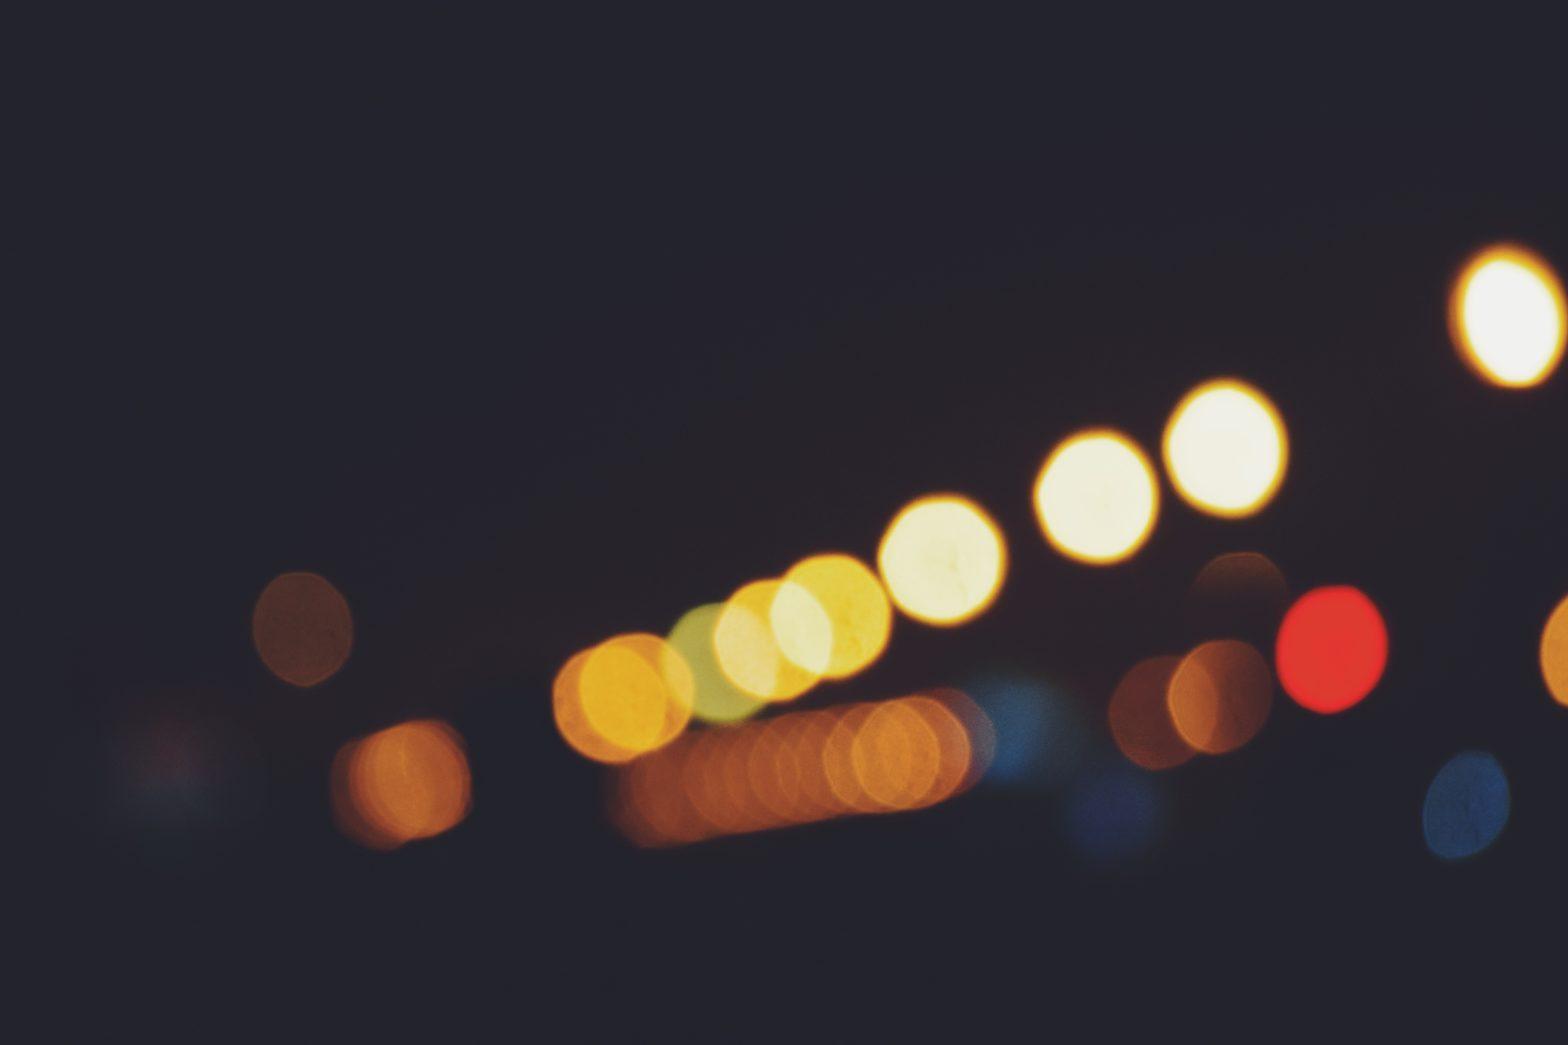 LED Straßenbeleuchtung